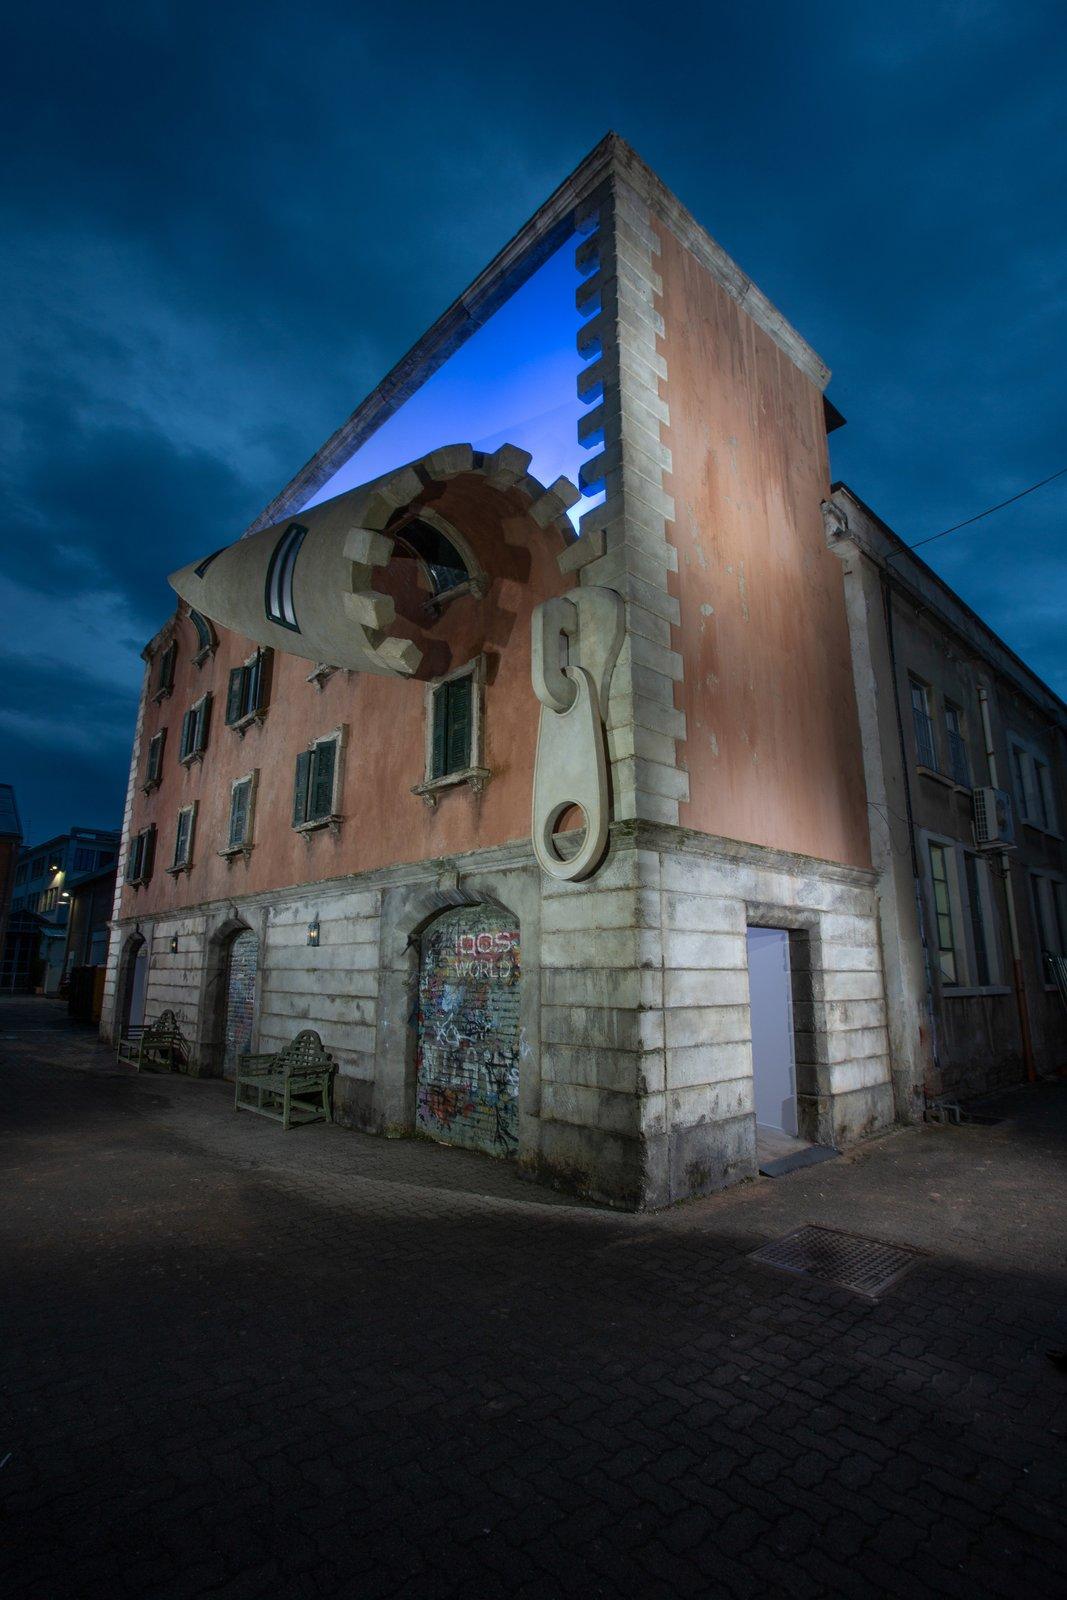 IQOS World Revealed unzipped building exterior